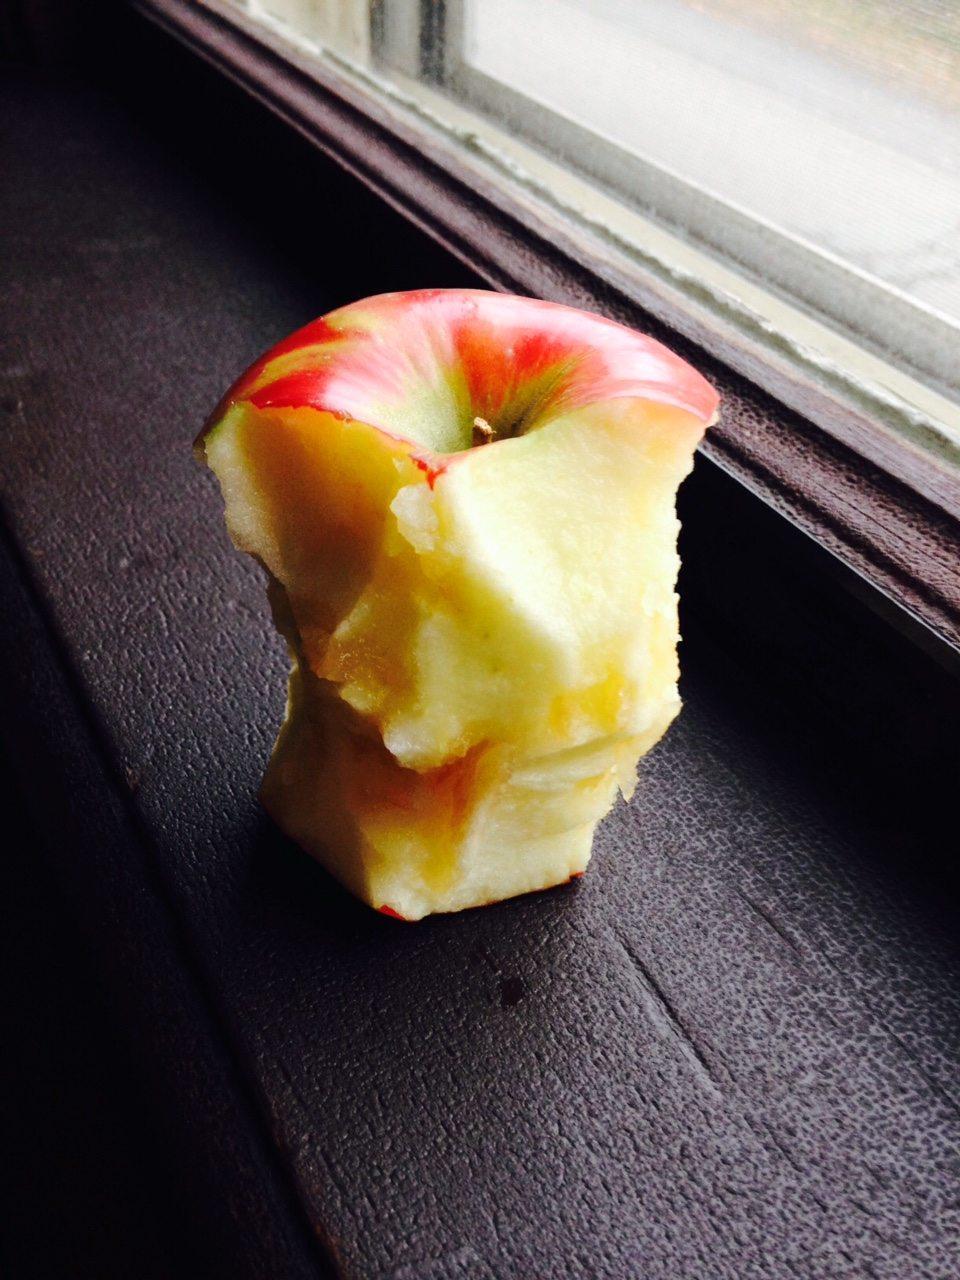 toronto-chefs-restaurants-consumed-bob-blumer-food-network-surreal-gourmet-apple